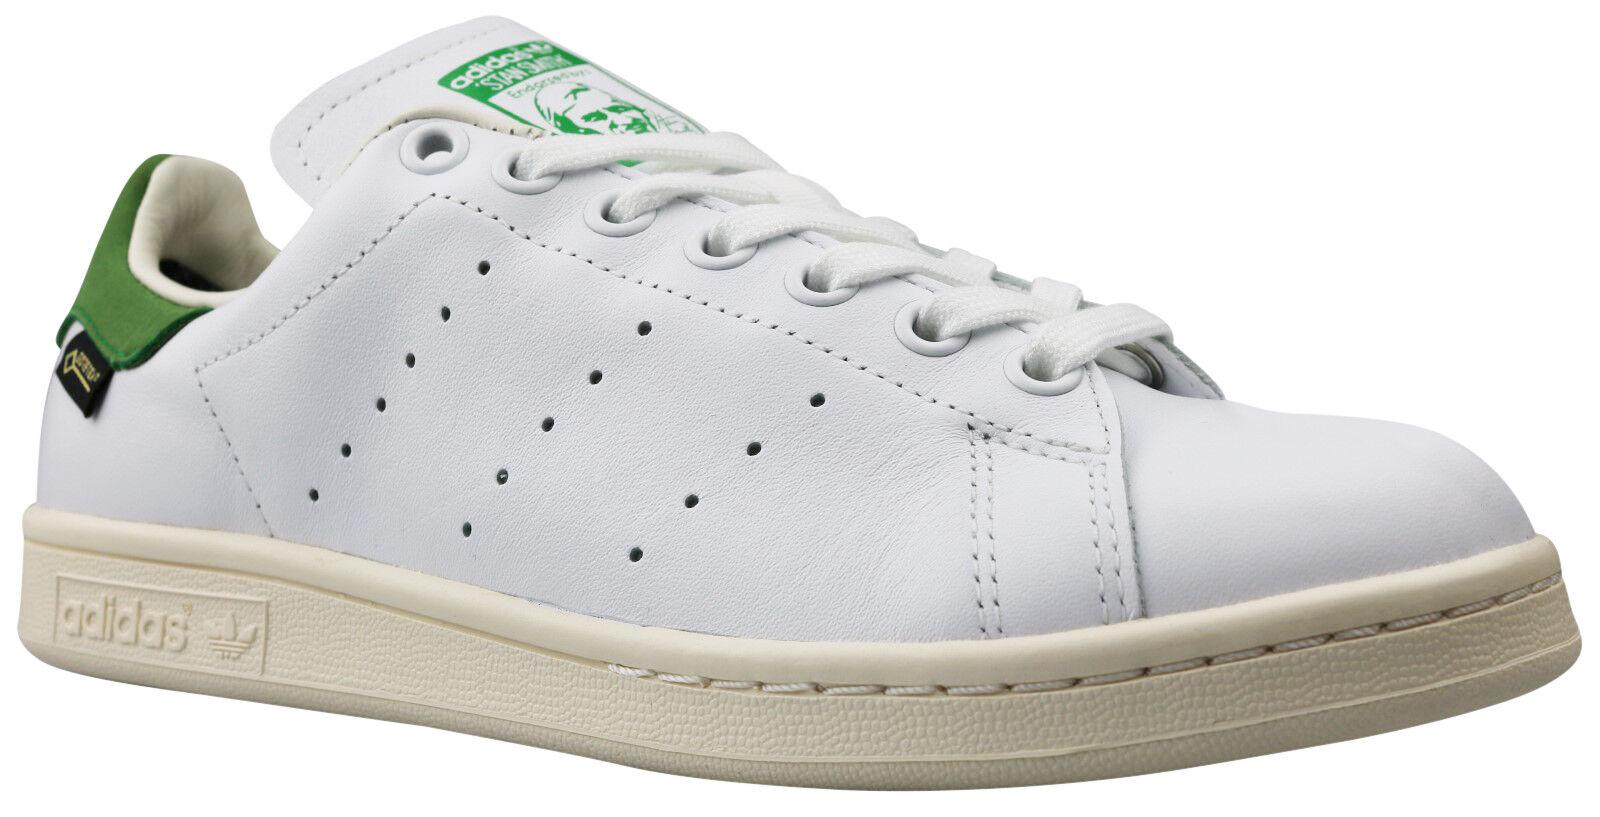 Adidas Stan Smith GTX Gore Tex Chaussures baskets BLANC TAILLE 36 & 37 s80049 NOUVEAU & NEUF dans sa boîte